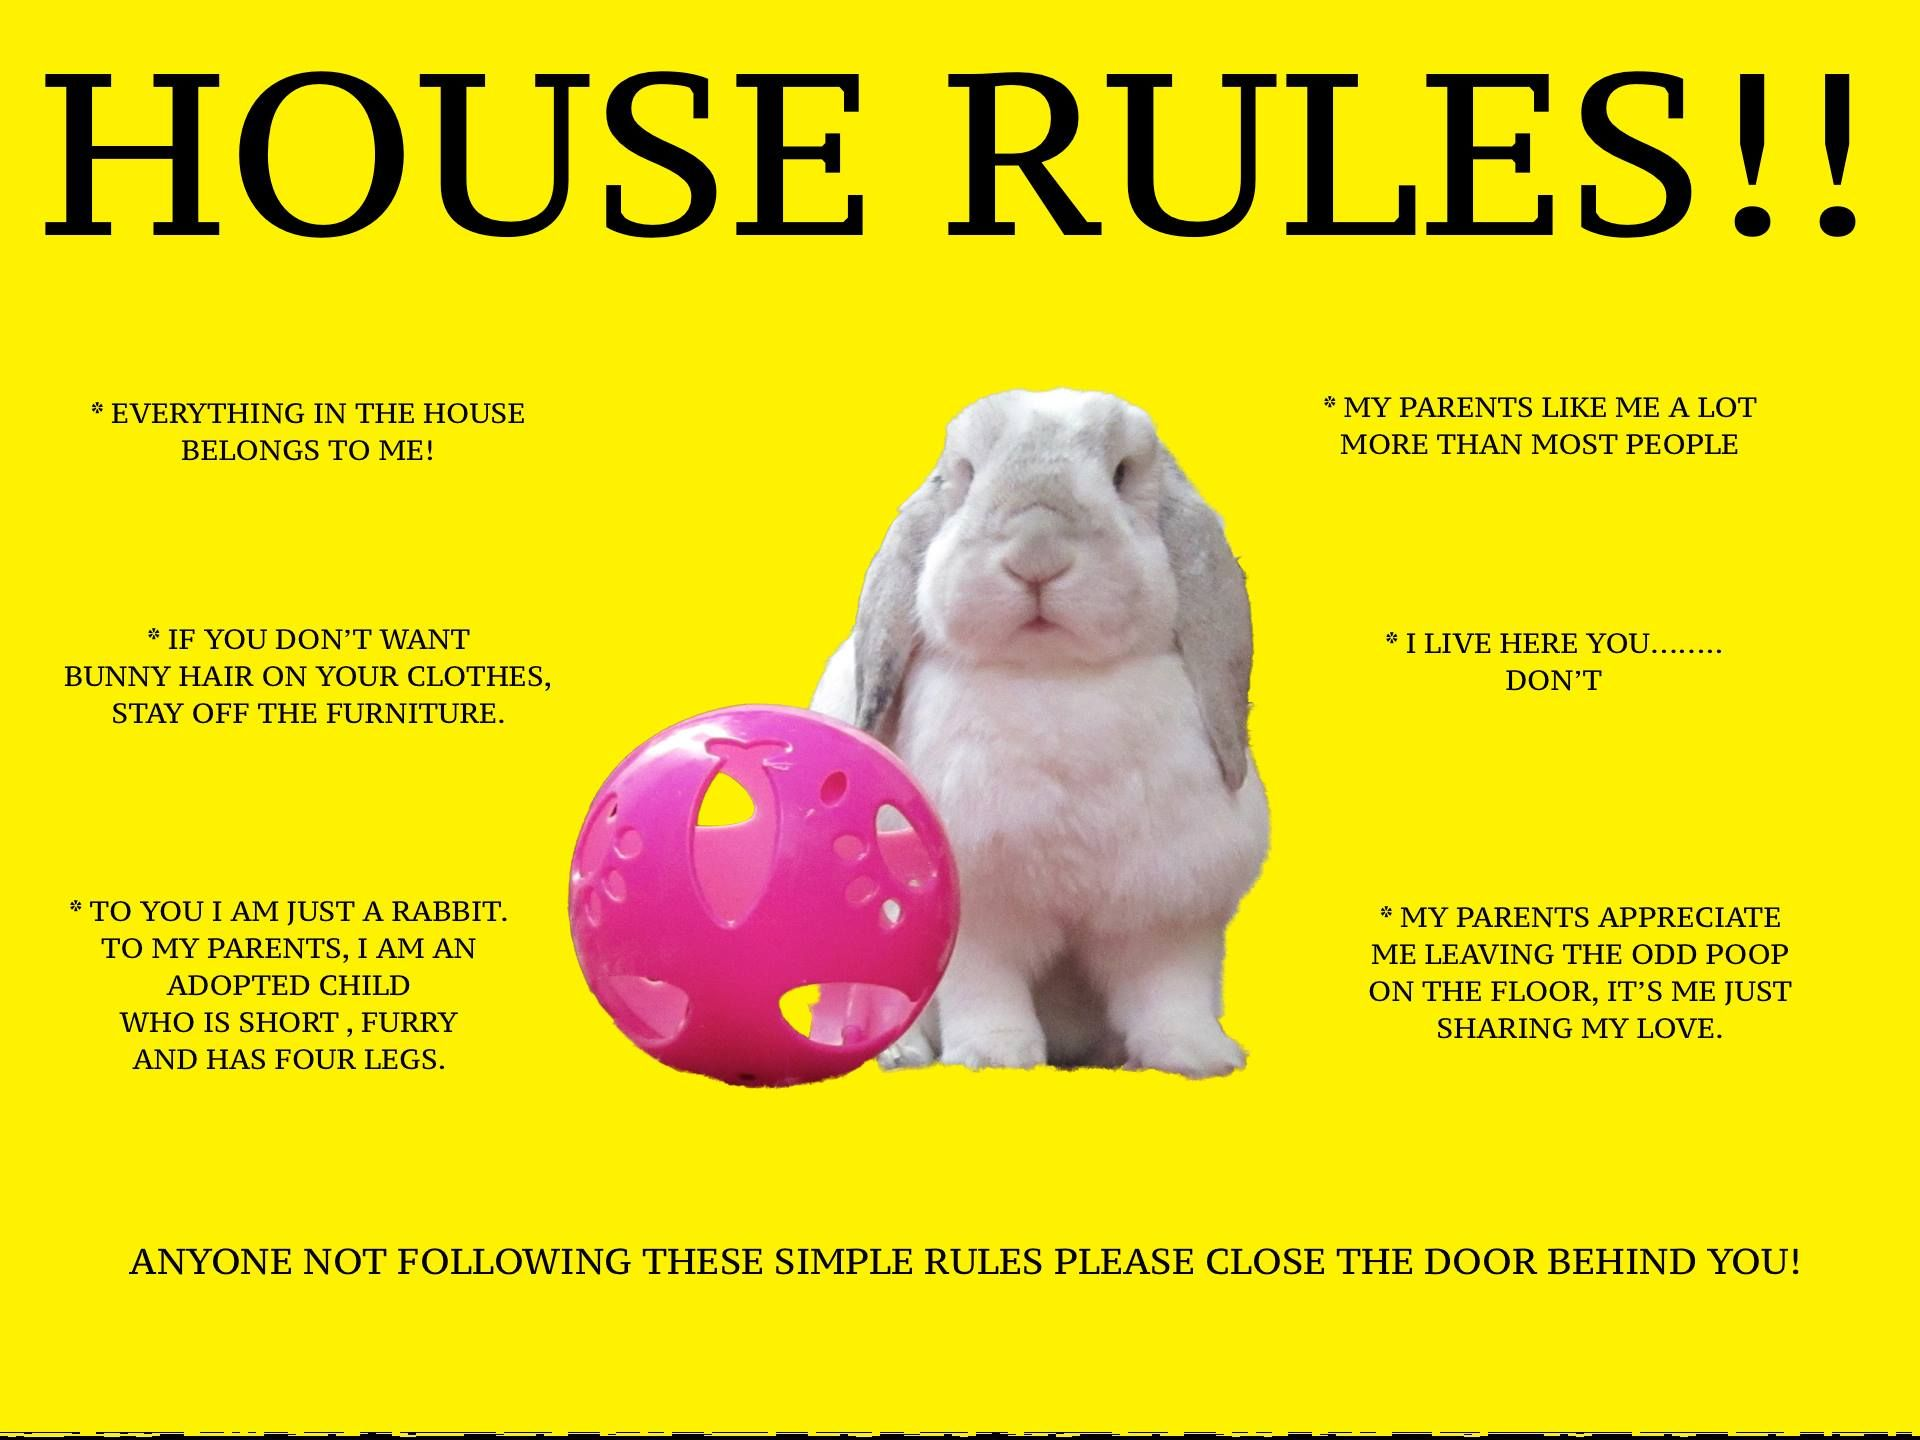 House Rules Lol 02 07 14 Crazy Bunny Lady Pet Bunny Bunny